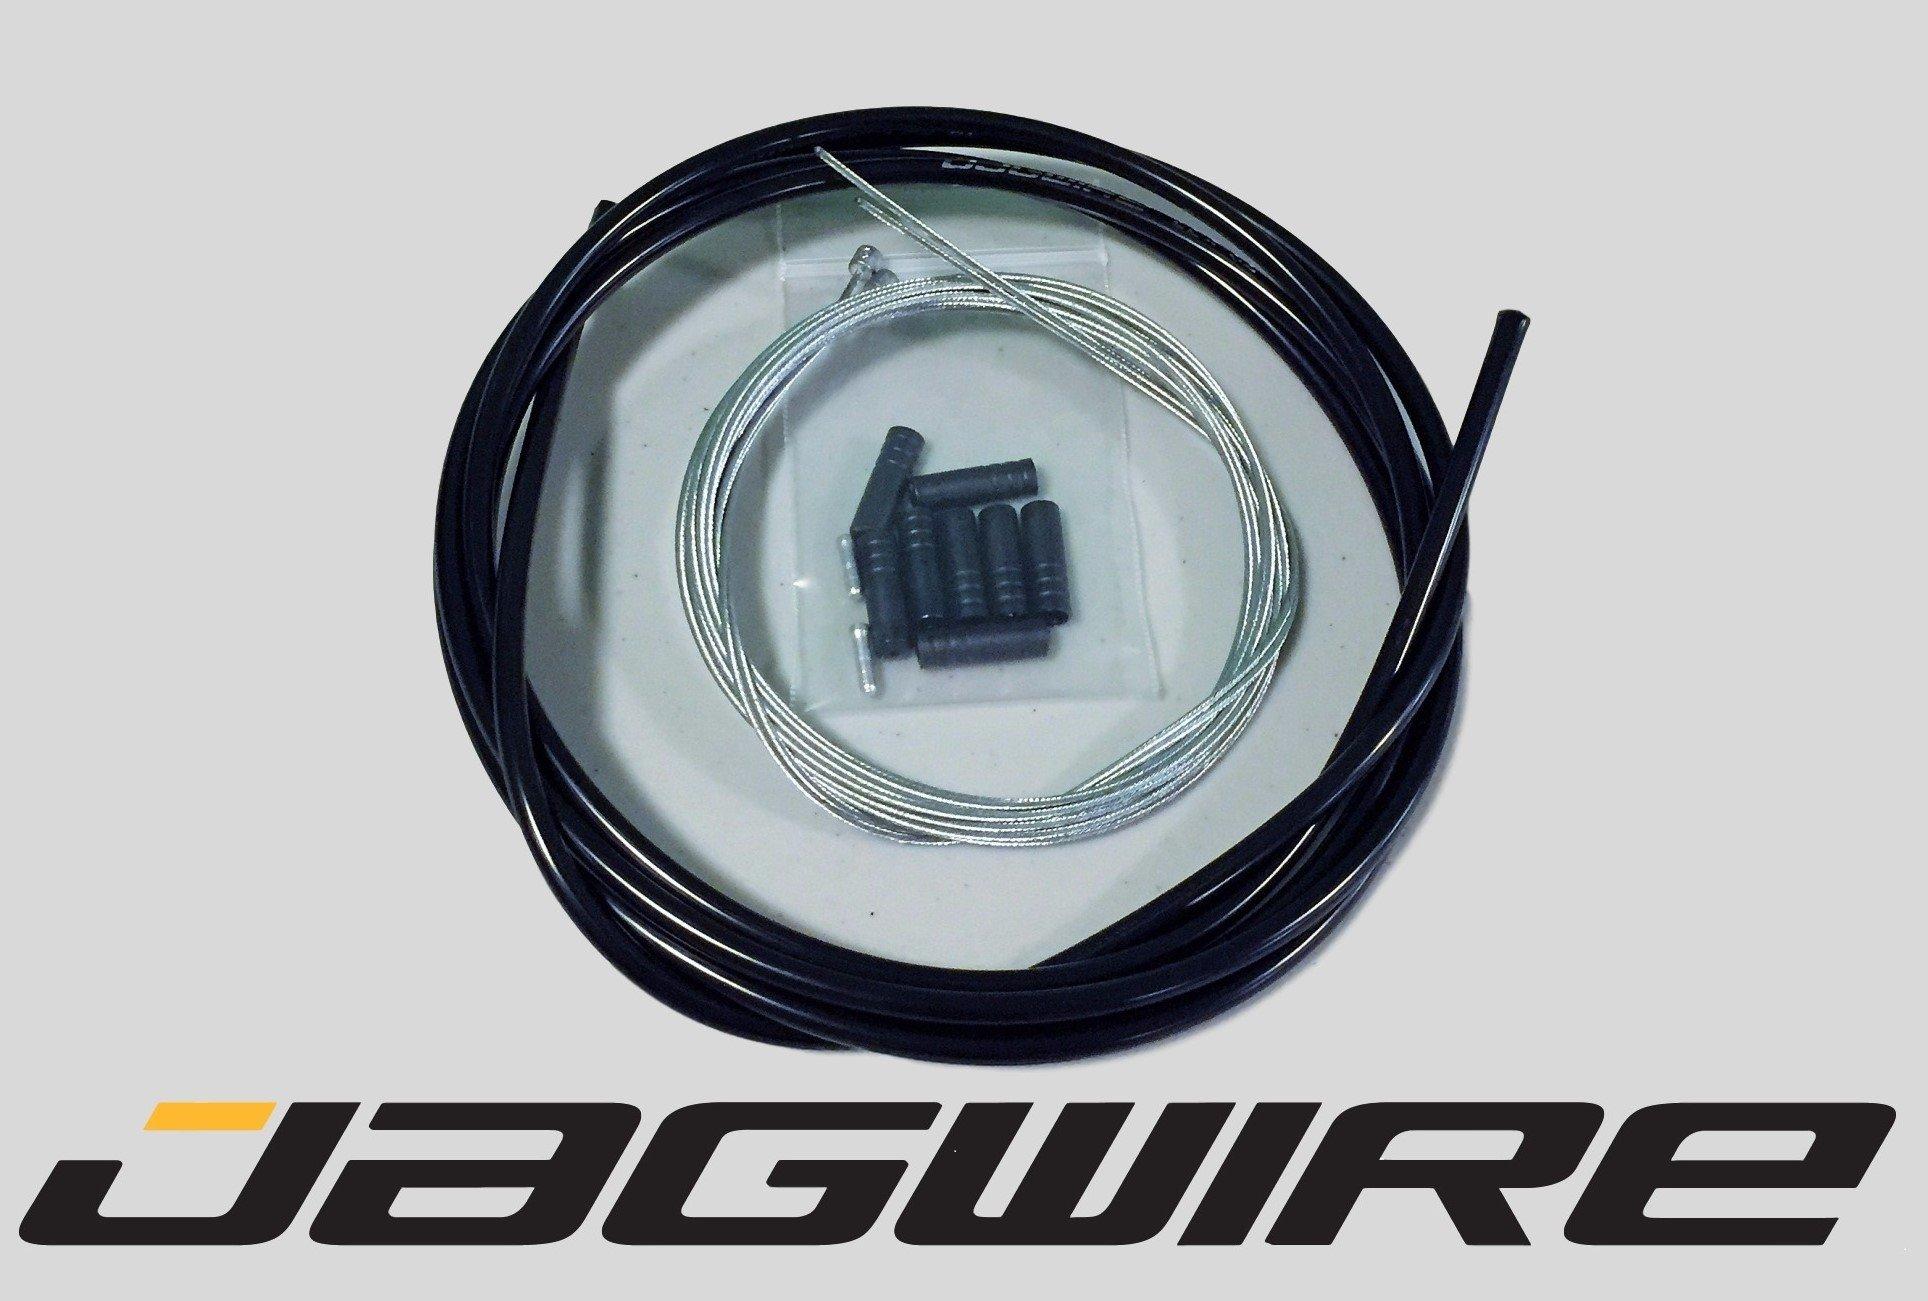 JAGWIRE MOUNTAIN XL SHOP KIT - Shift Cable & Housing Kit - SRAM/Shimano MTB by Jagwire